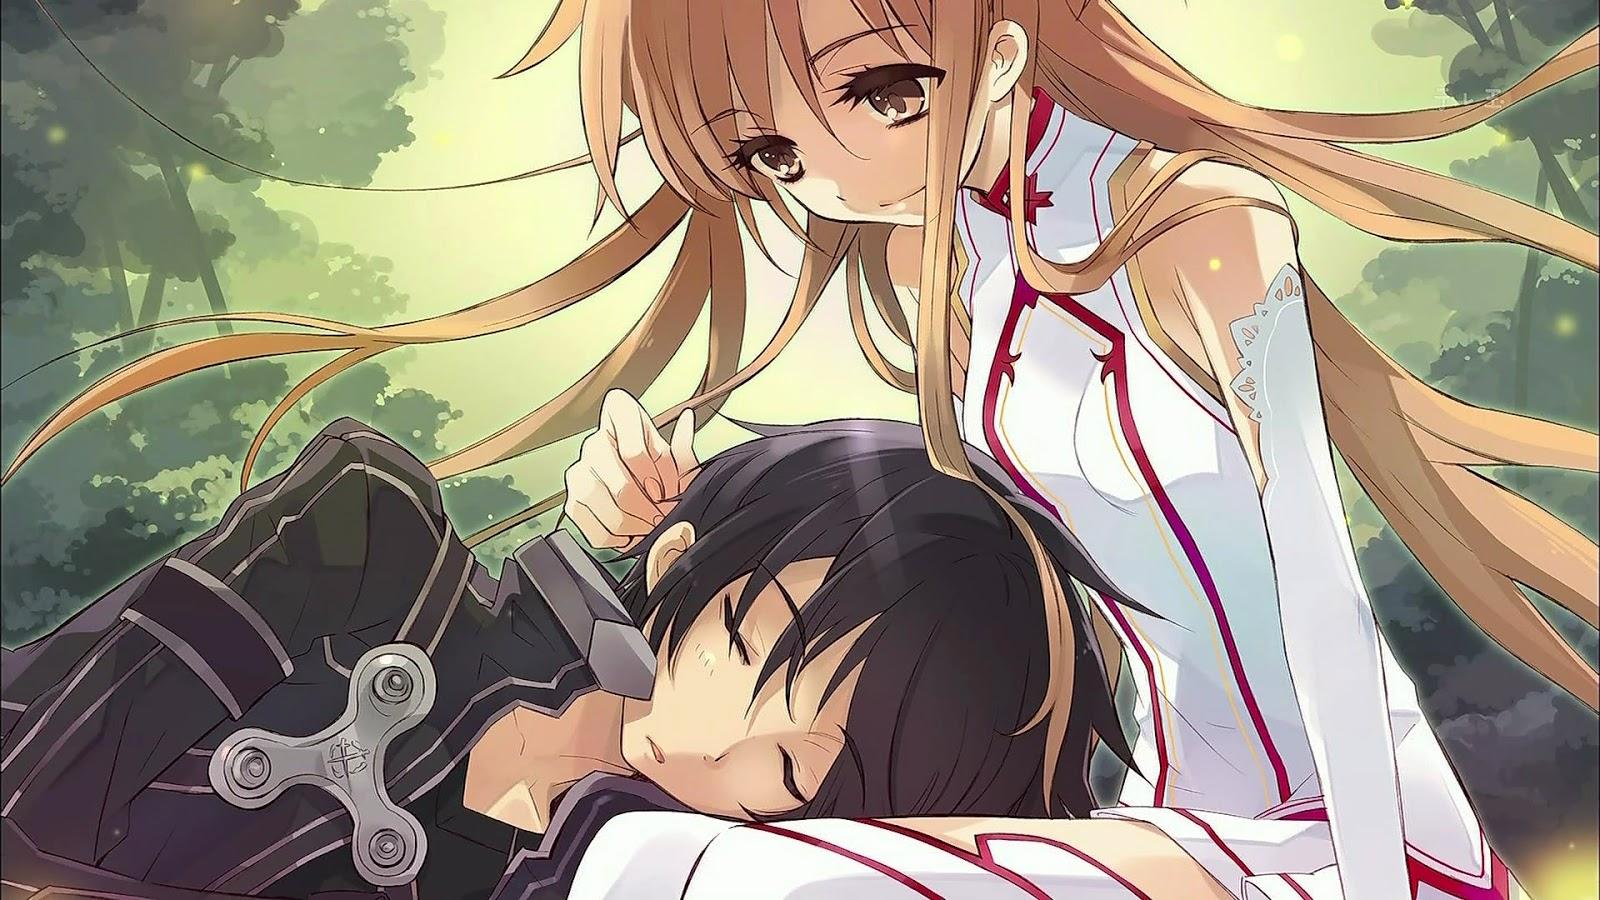 Wallpaper Gambar Kartun Romantis Jepang Terbaru Gambar - Kirito And Asuna Hot - HD Wallpaper